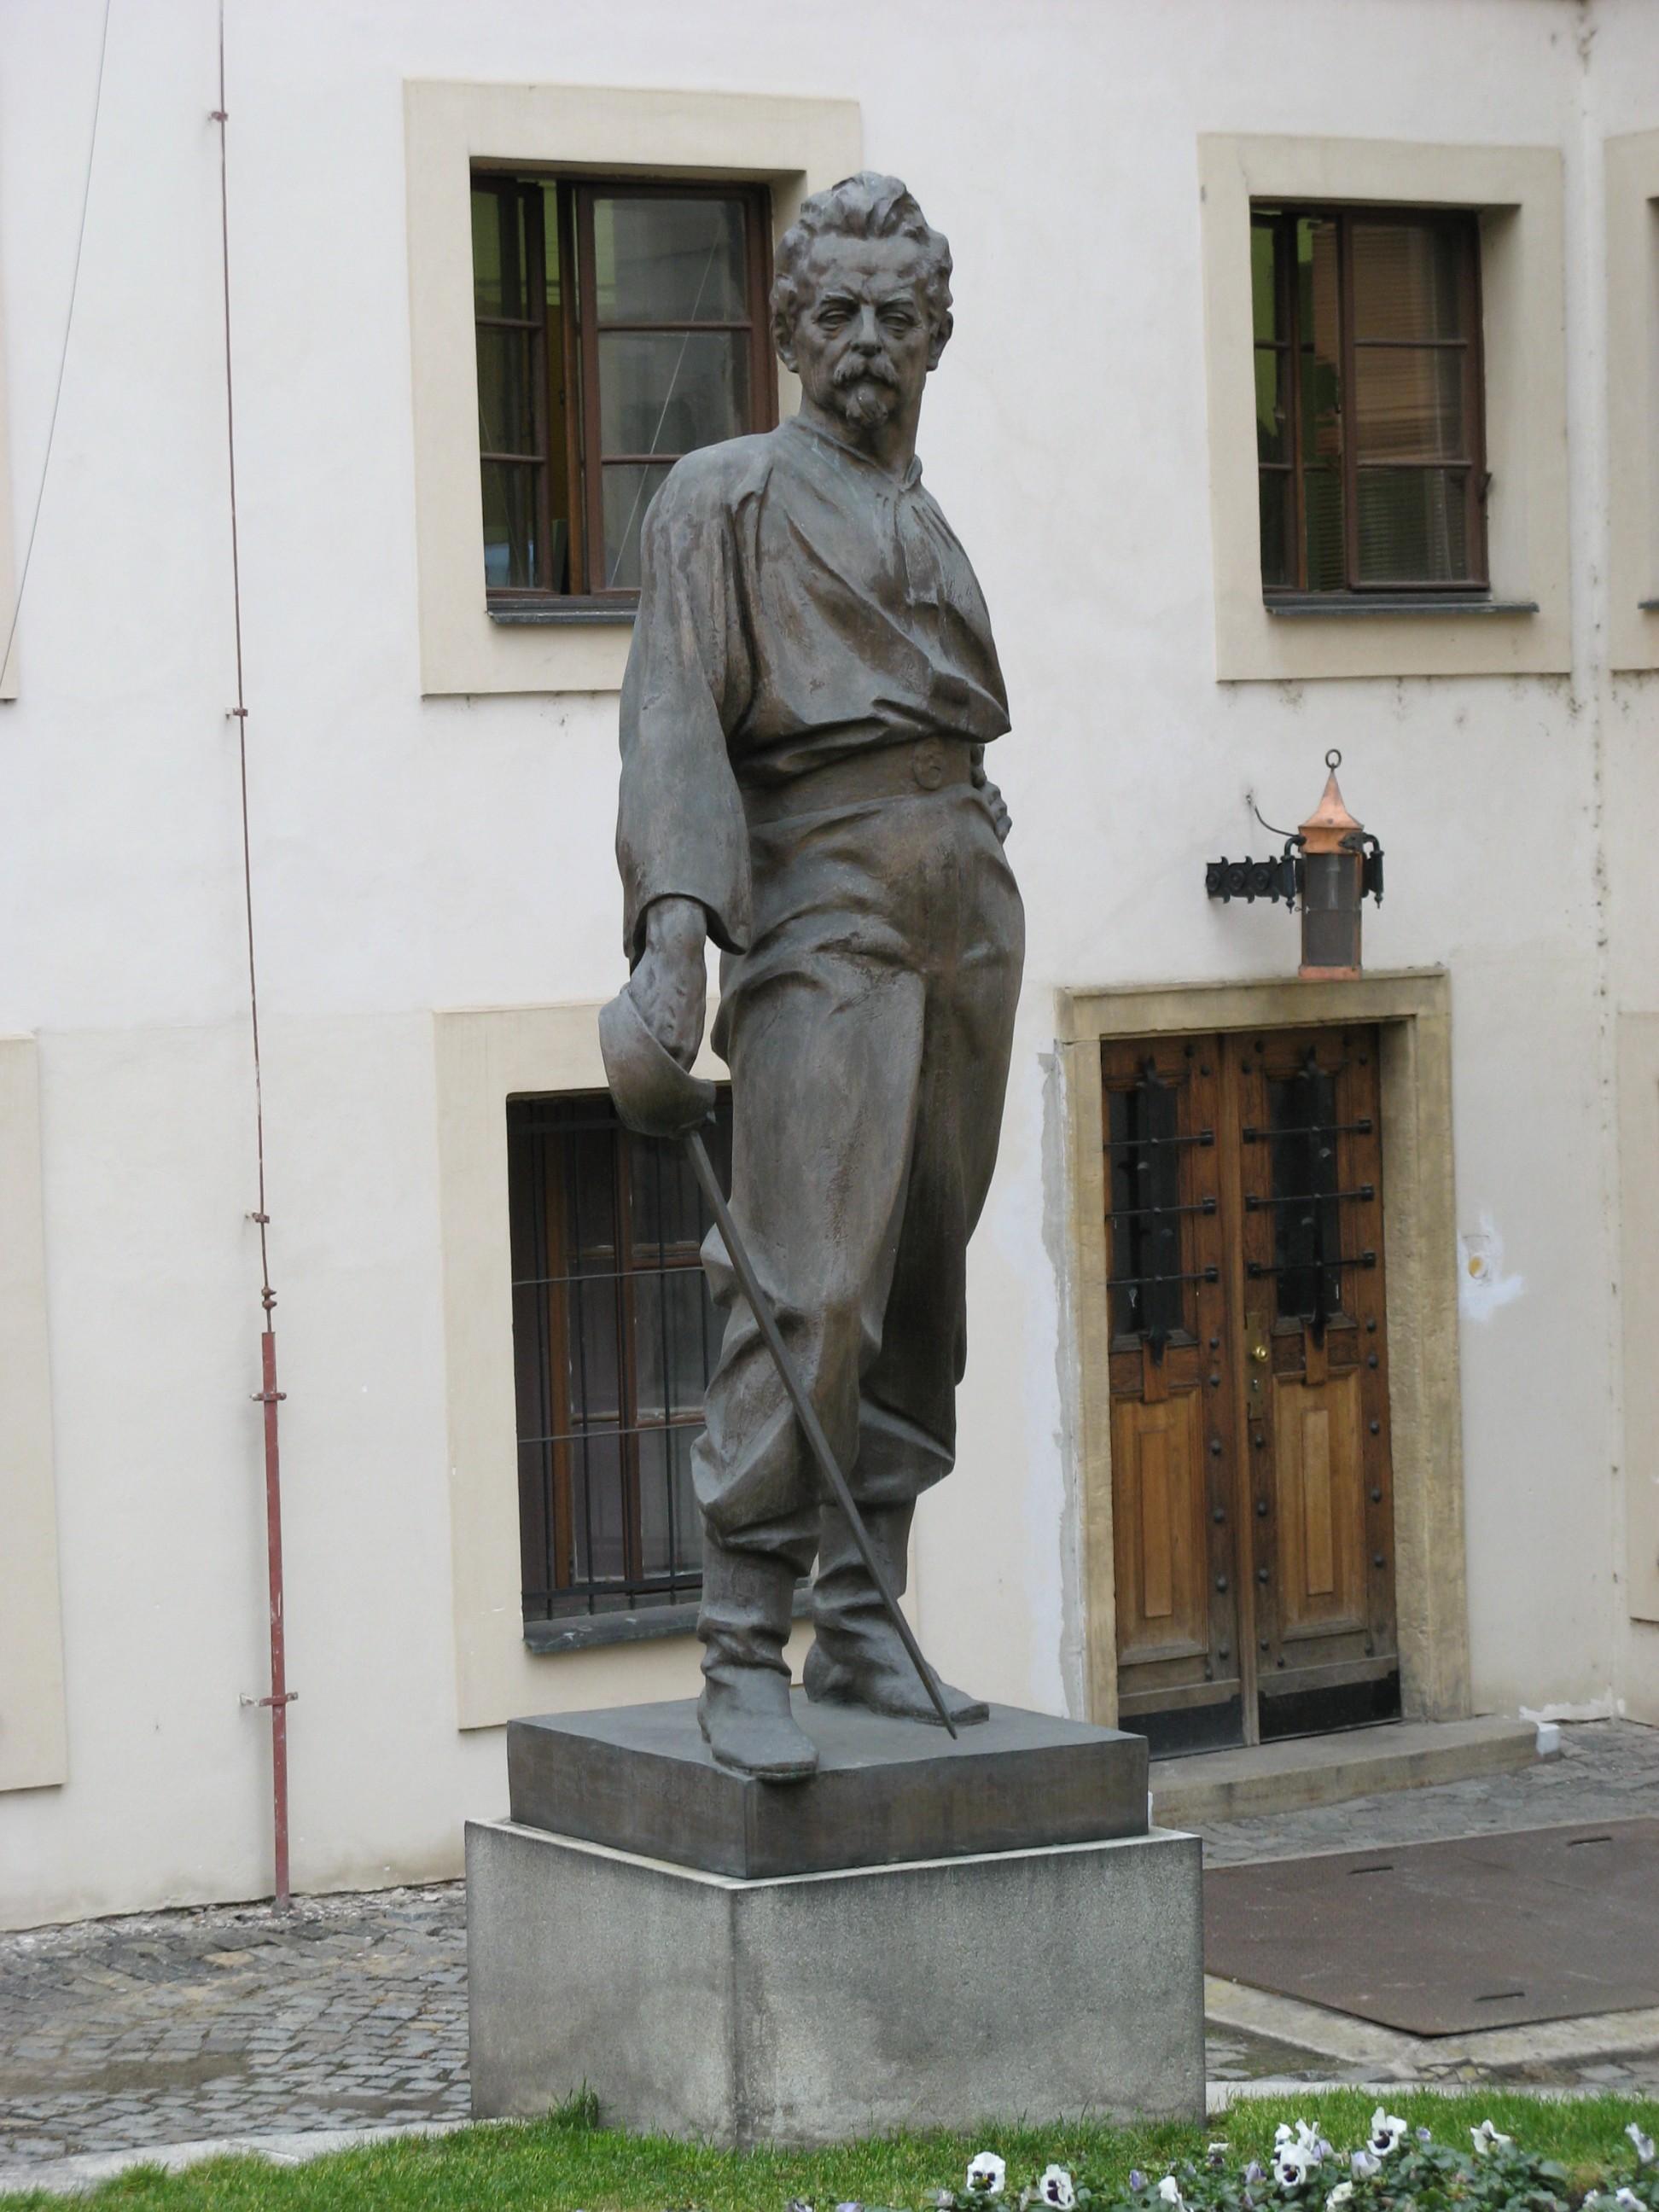 https://upload.wikimedia.org/wikipedia/commons/9/9d/Miroslav_Tyrs_%28Ladislav_Saloun%29.jpg